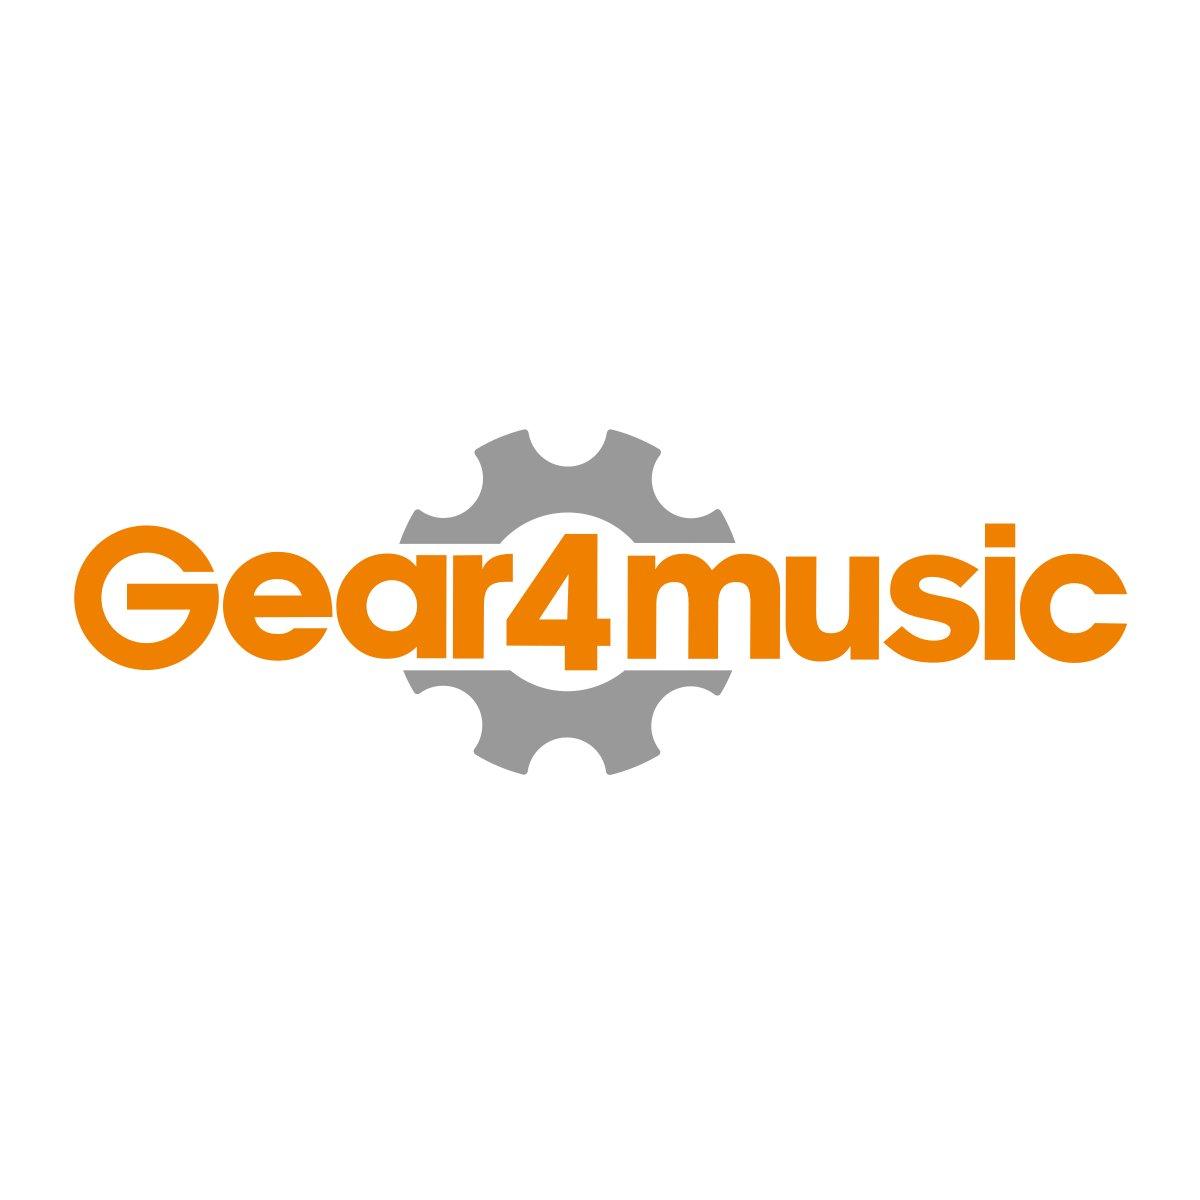 Alto Saxophone by Gear4music, Light Gold